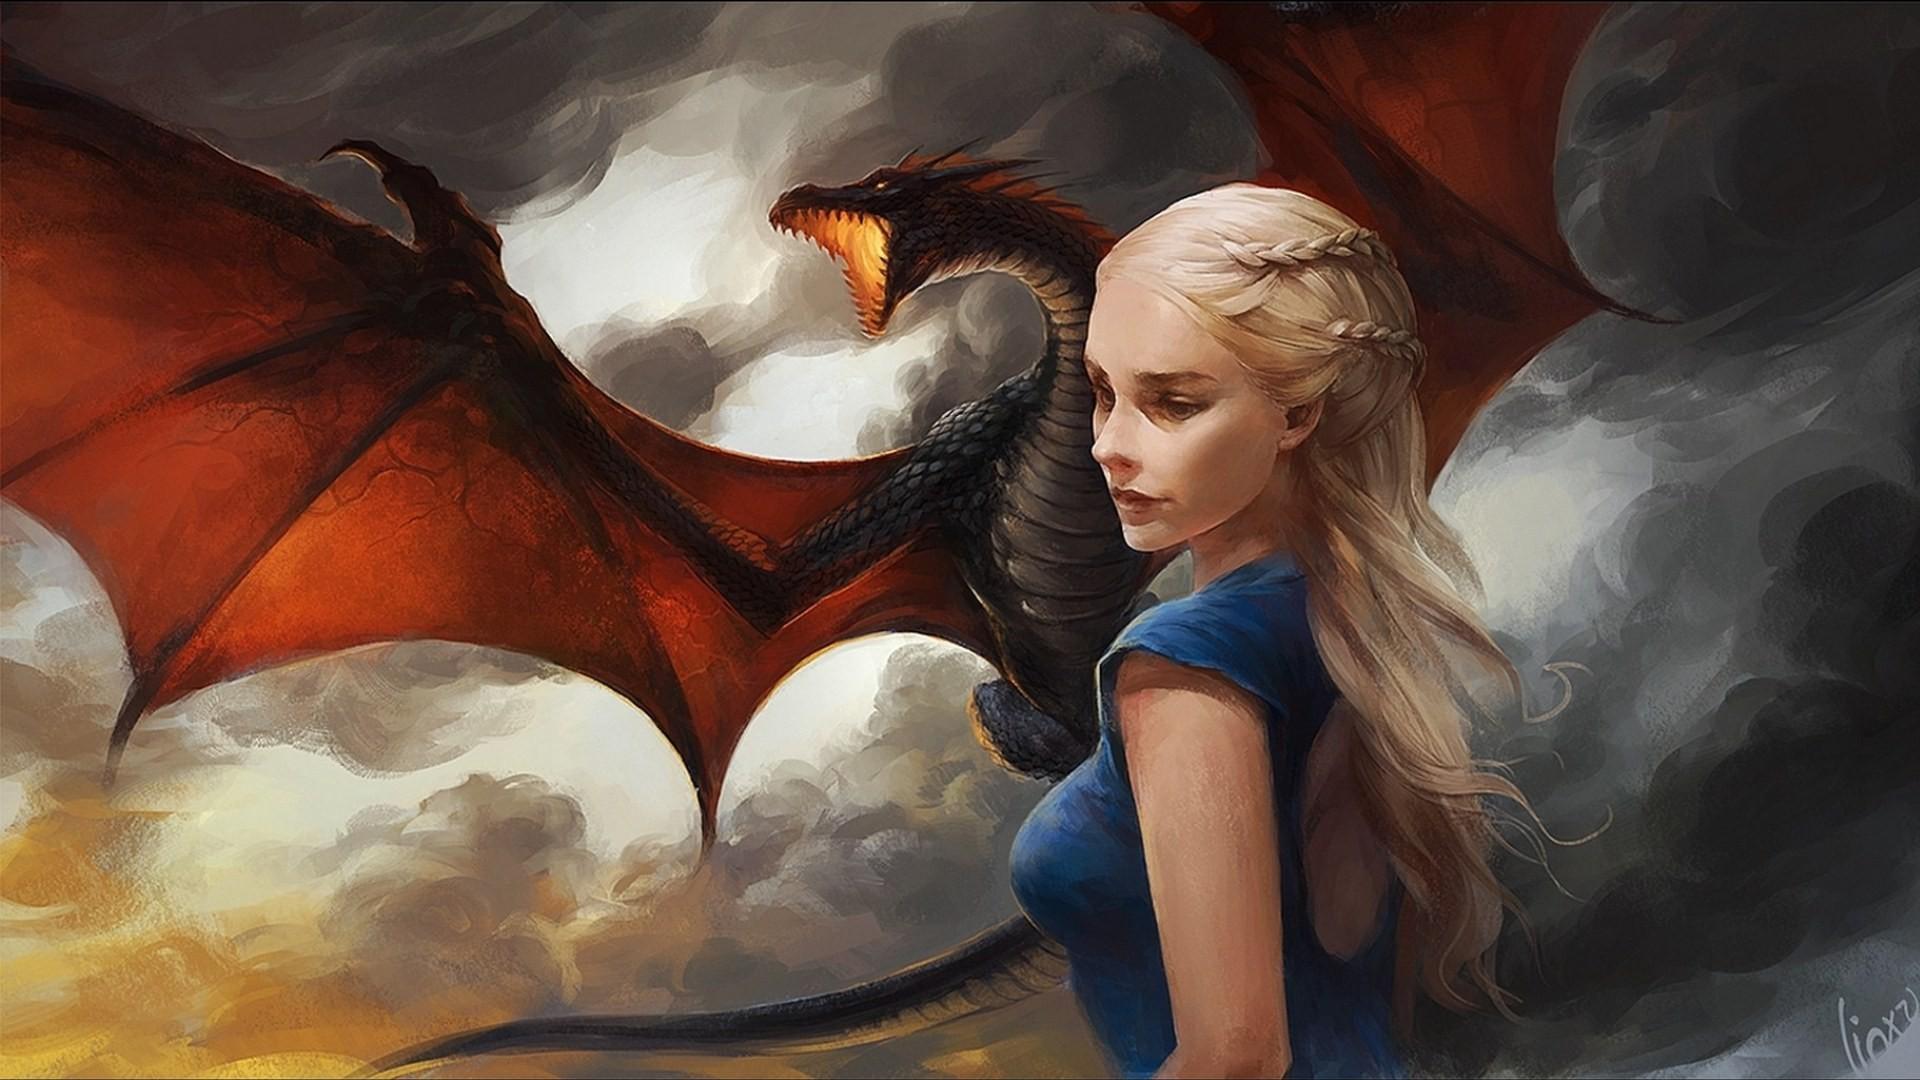 game of thrones art wallpaper - photo #16